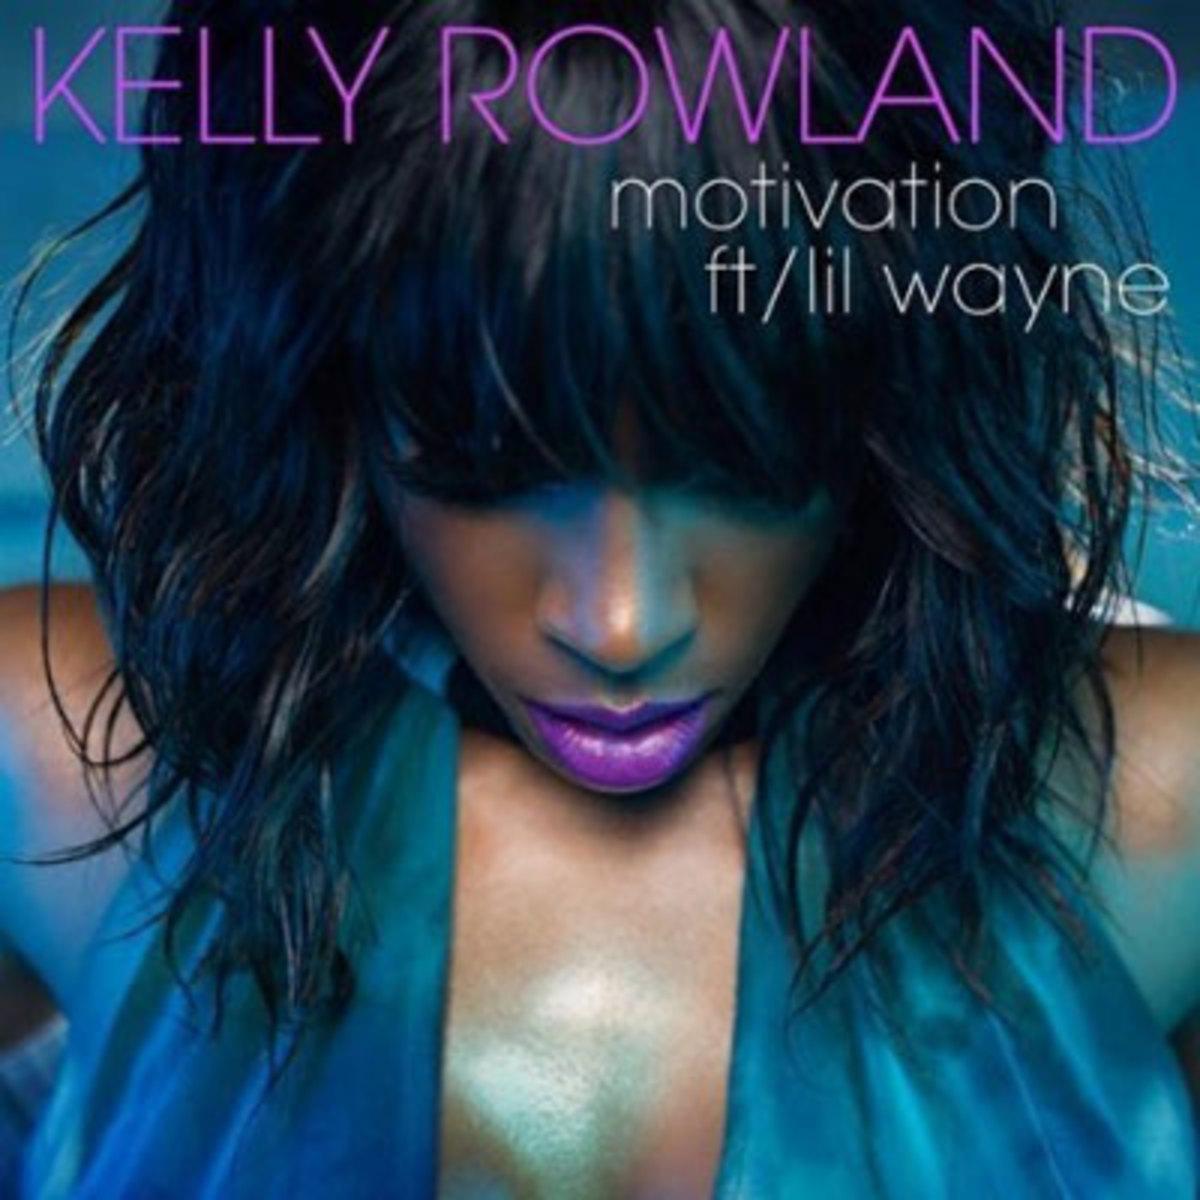 kellyrowland-motivation.jpg